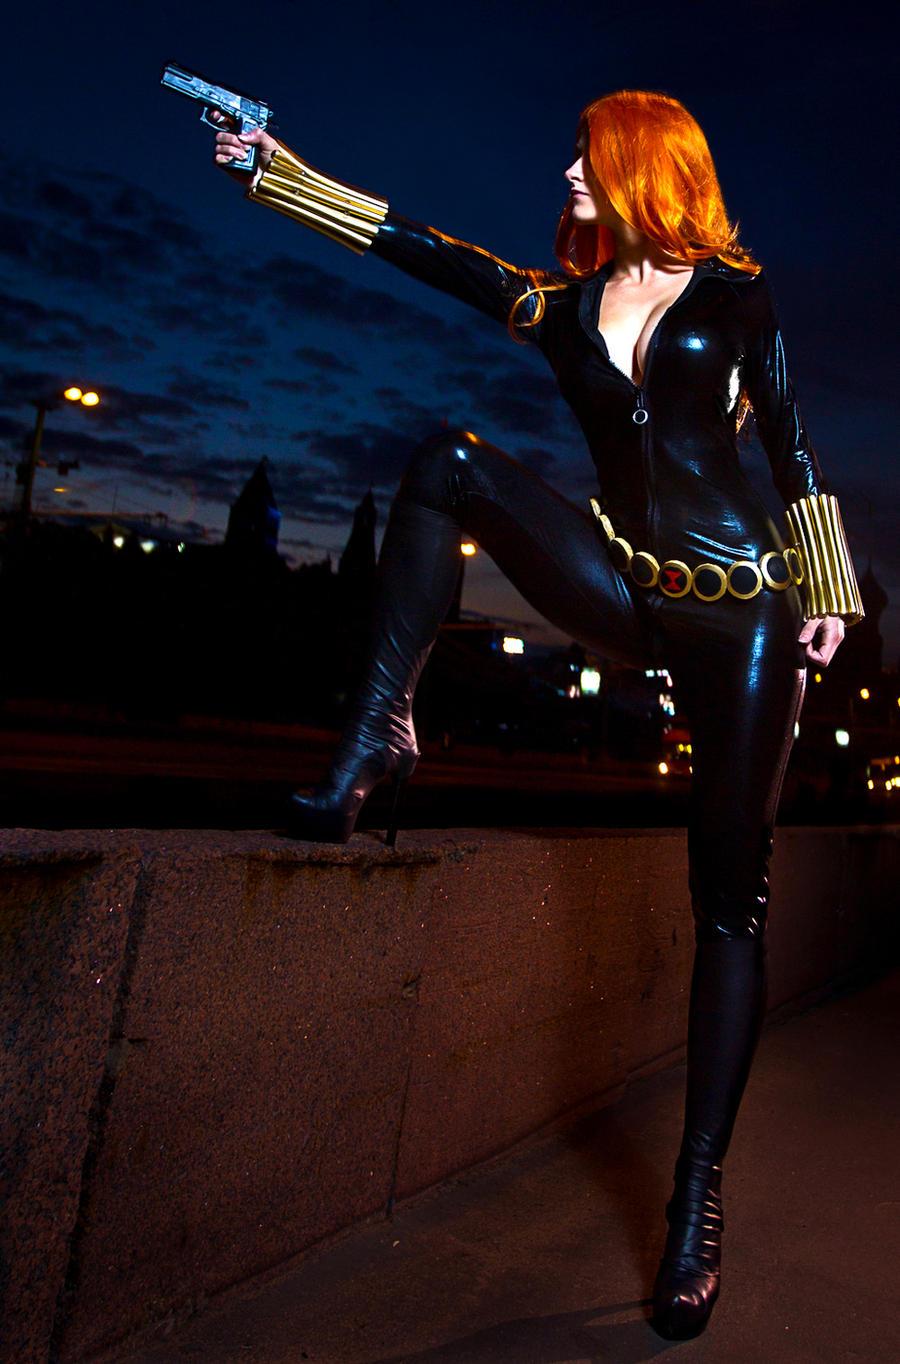 Black Widow by diacita